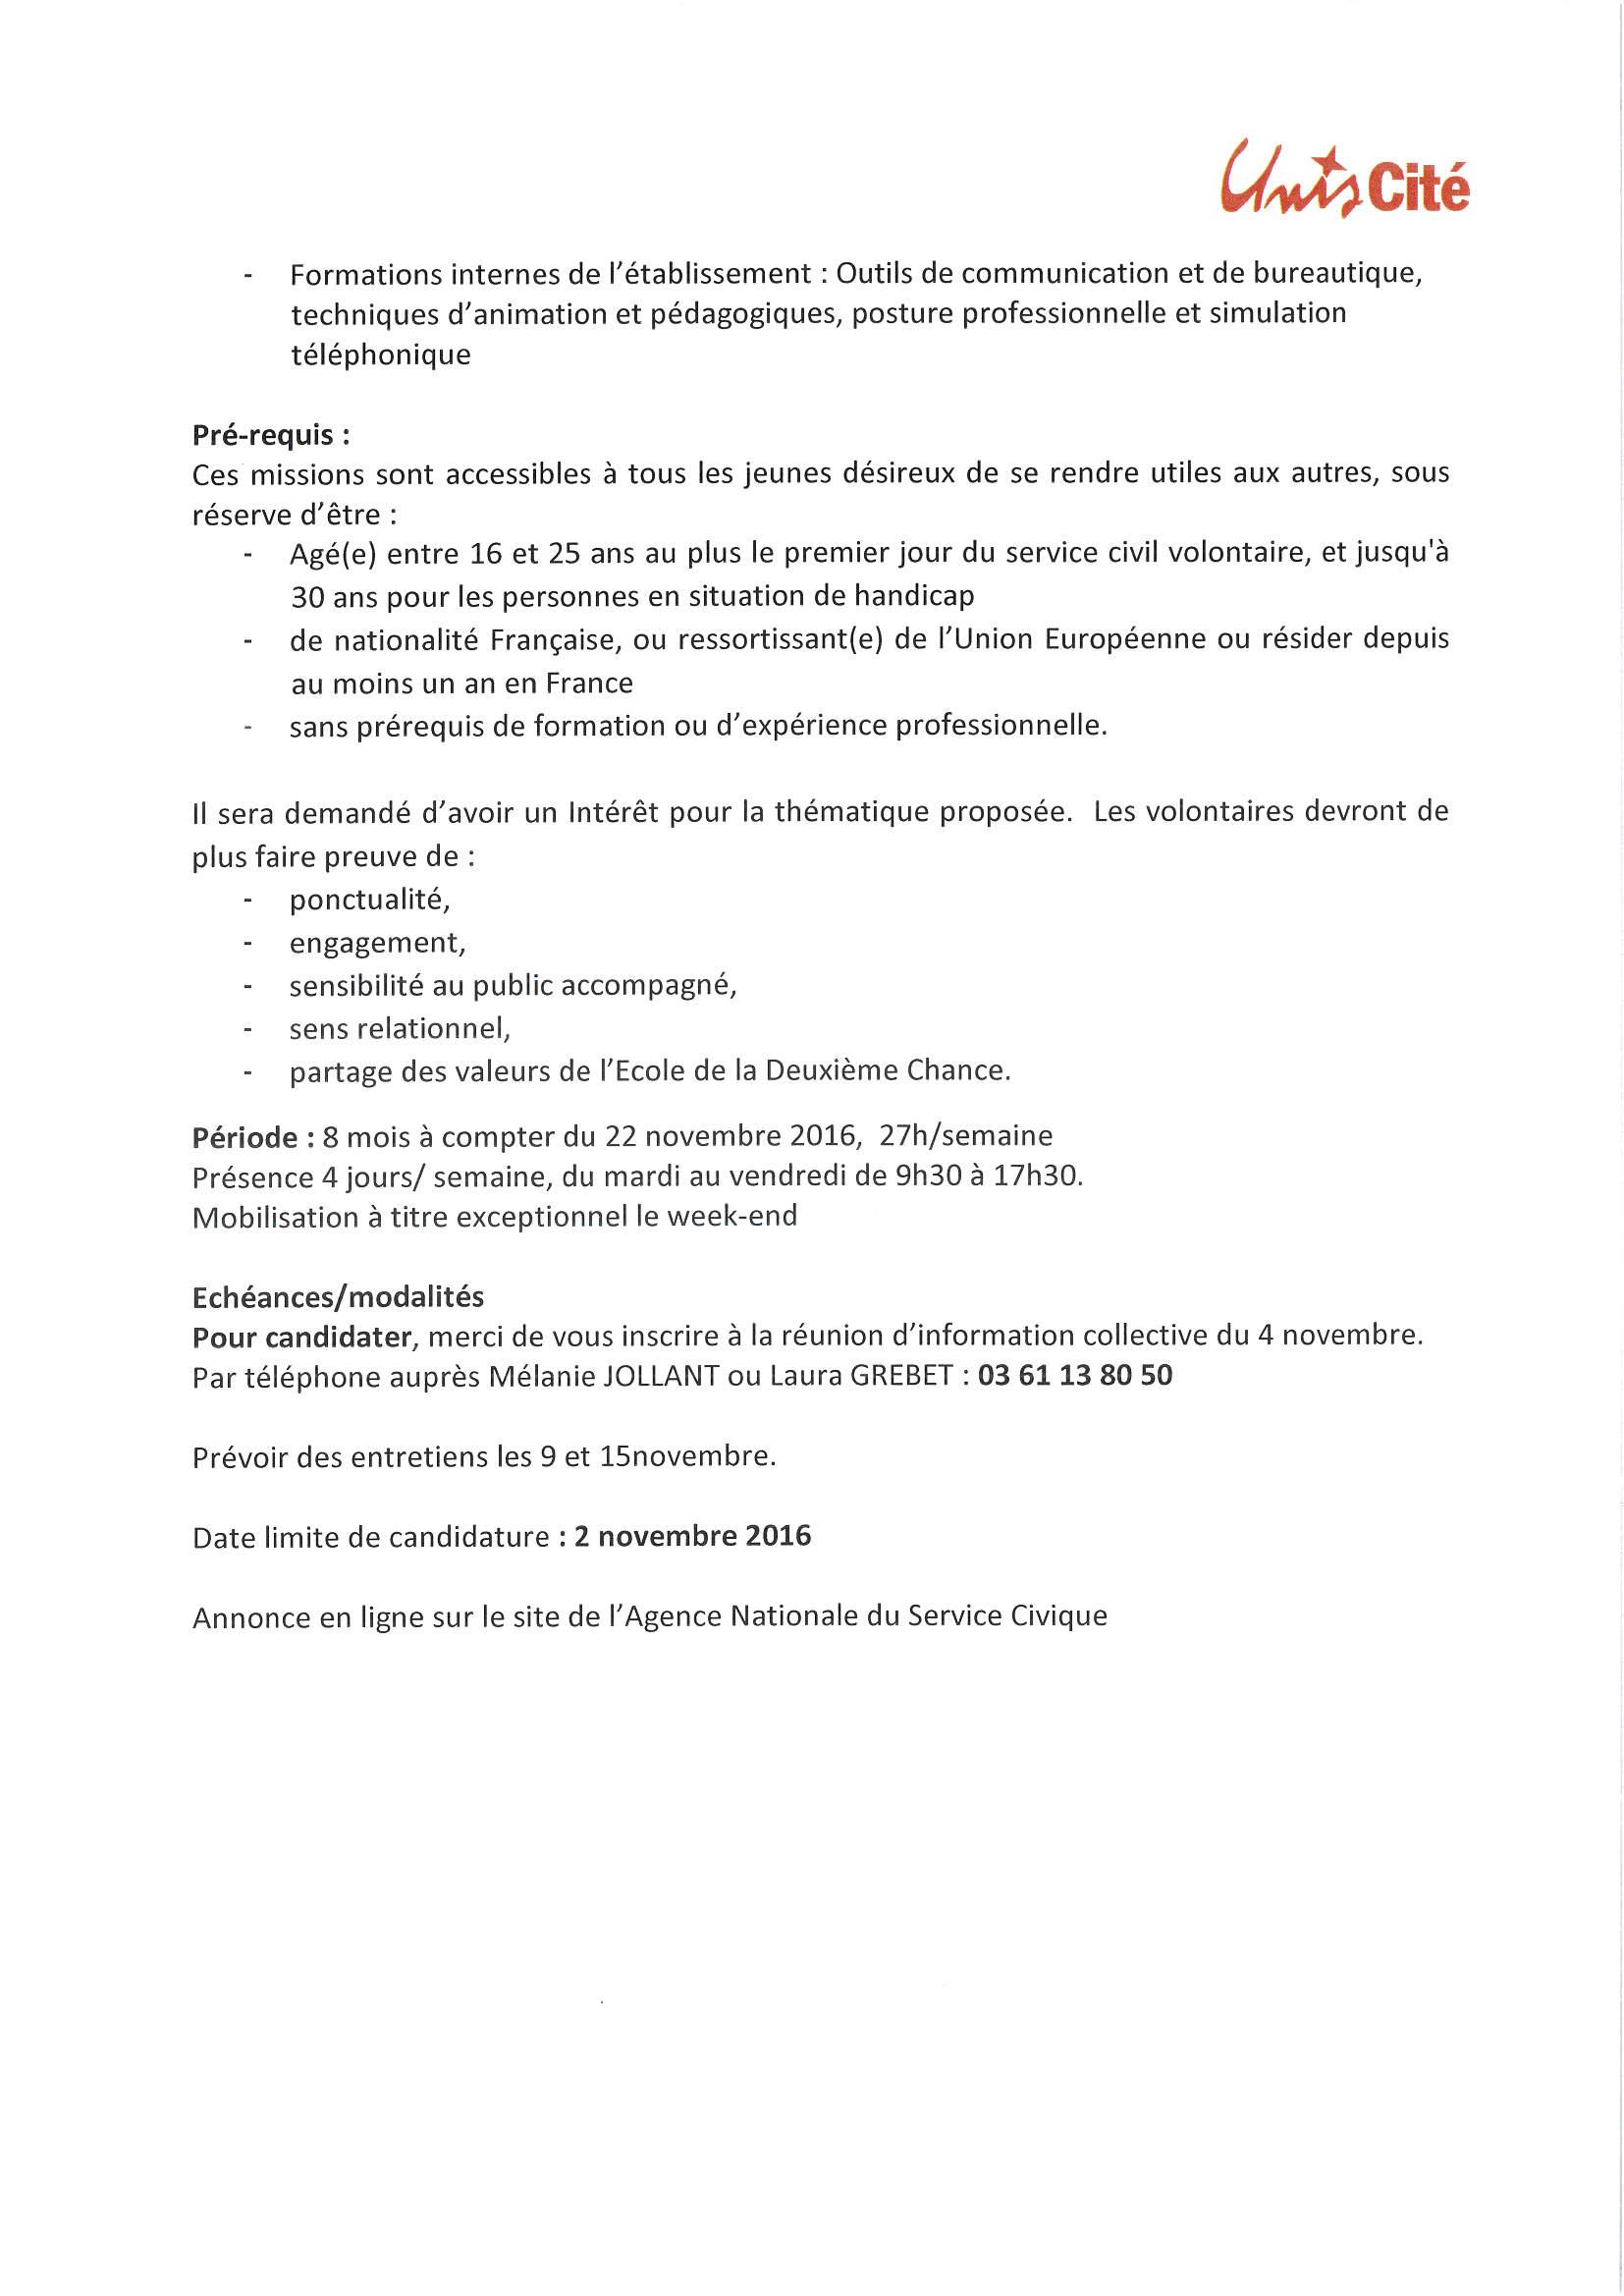 servicecivique_002.jpg